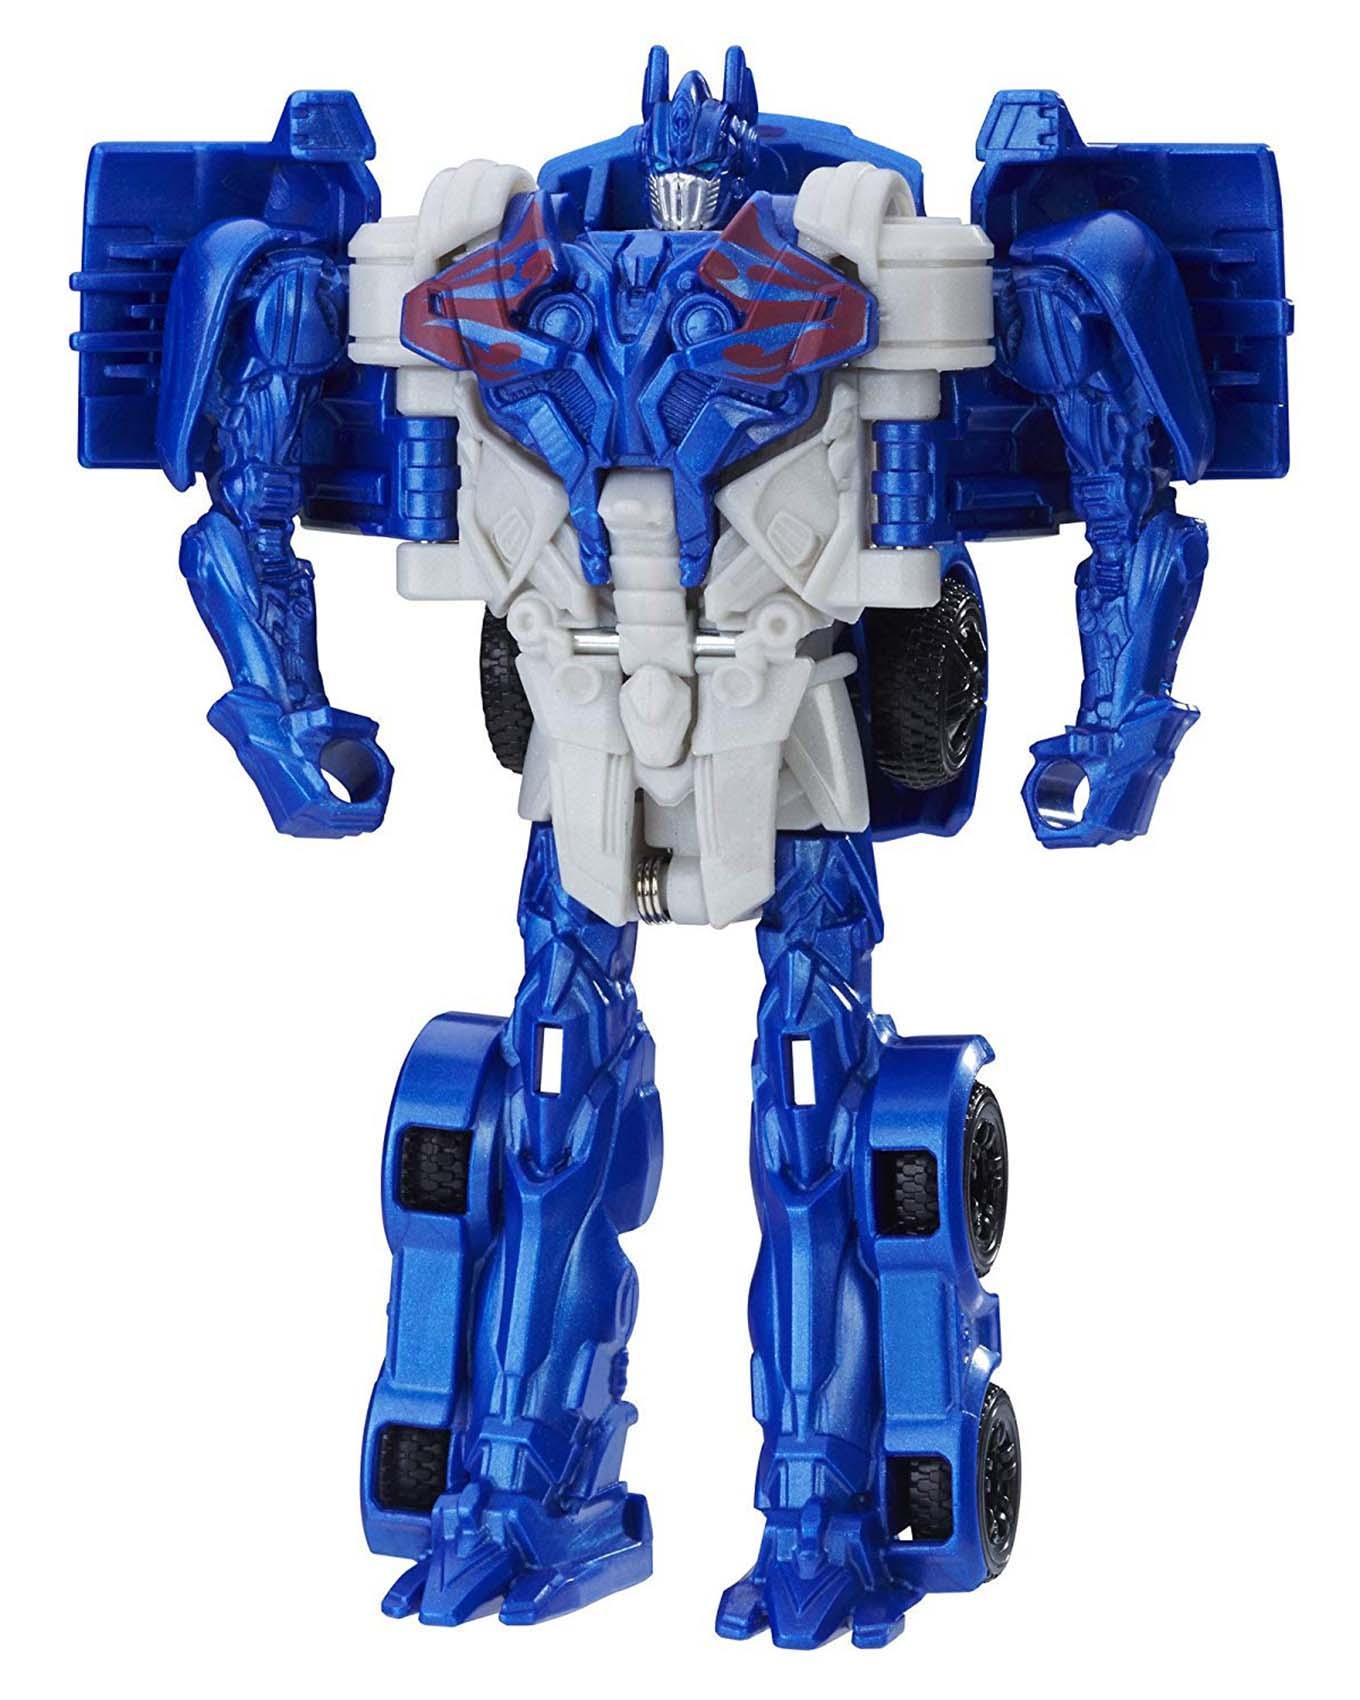 Transformer Step Turbo Changer Toy- Blue